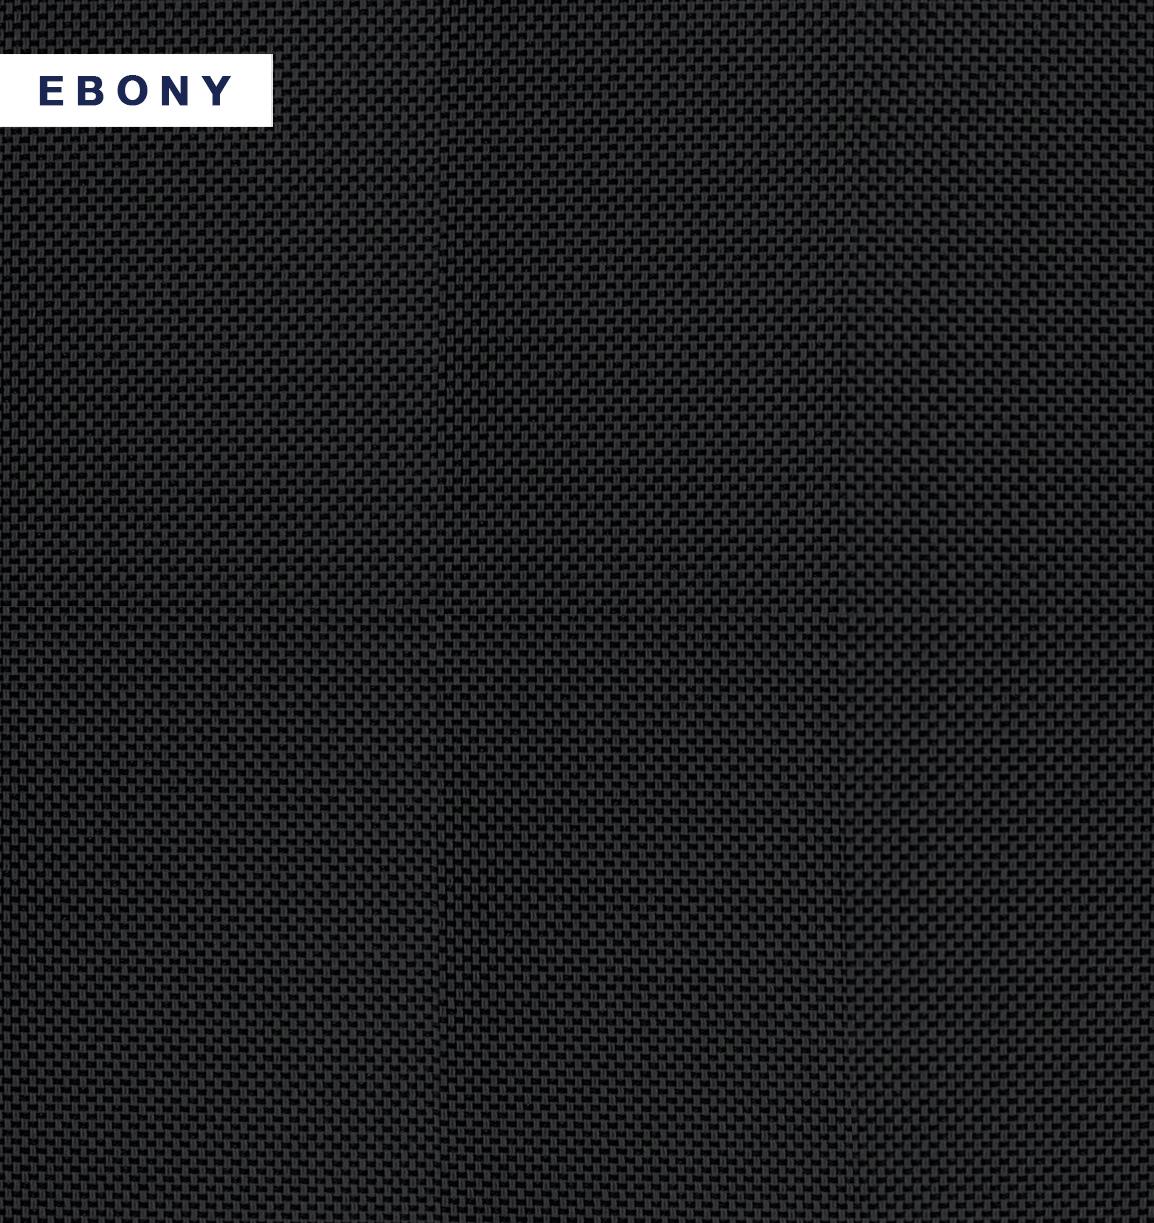 Phoenix - Ebony.jpg